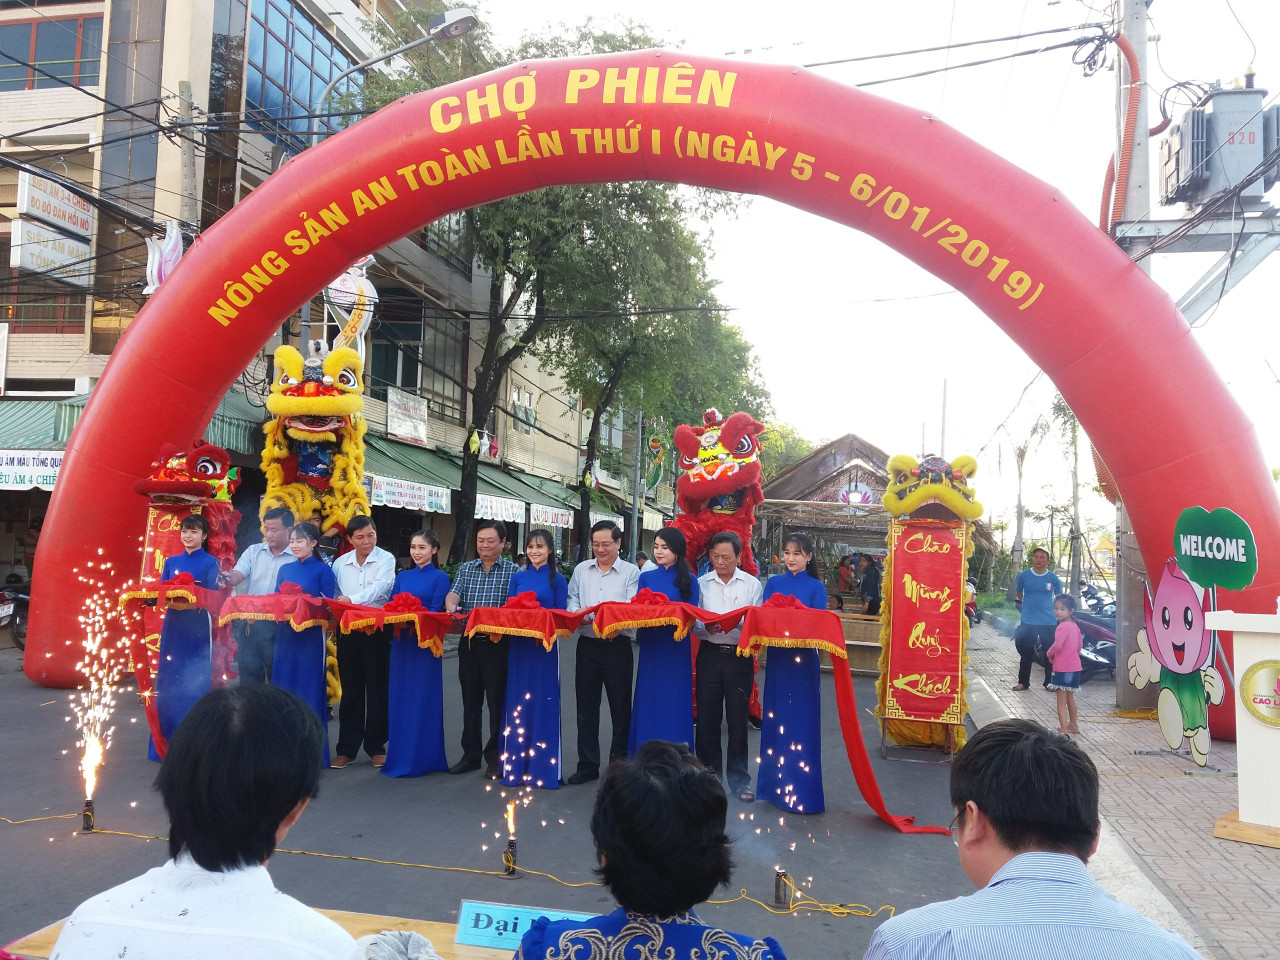 dong thap lan dau tien dien ra cho phien nong san an toan